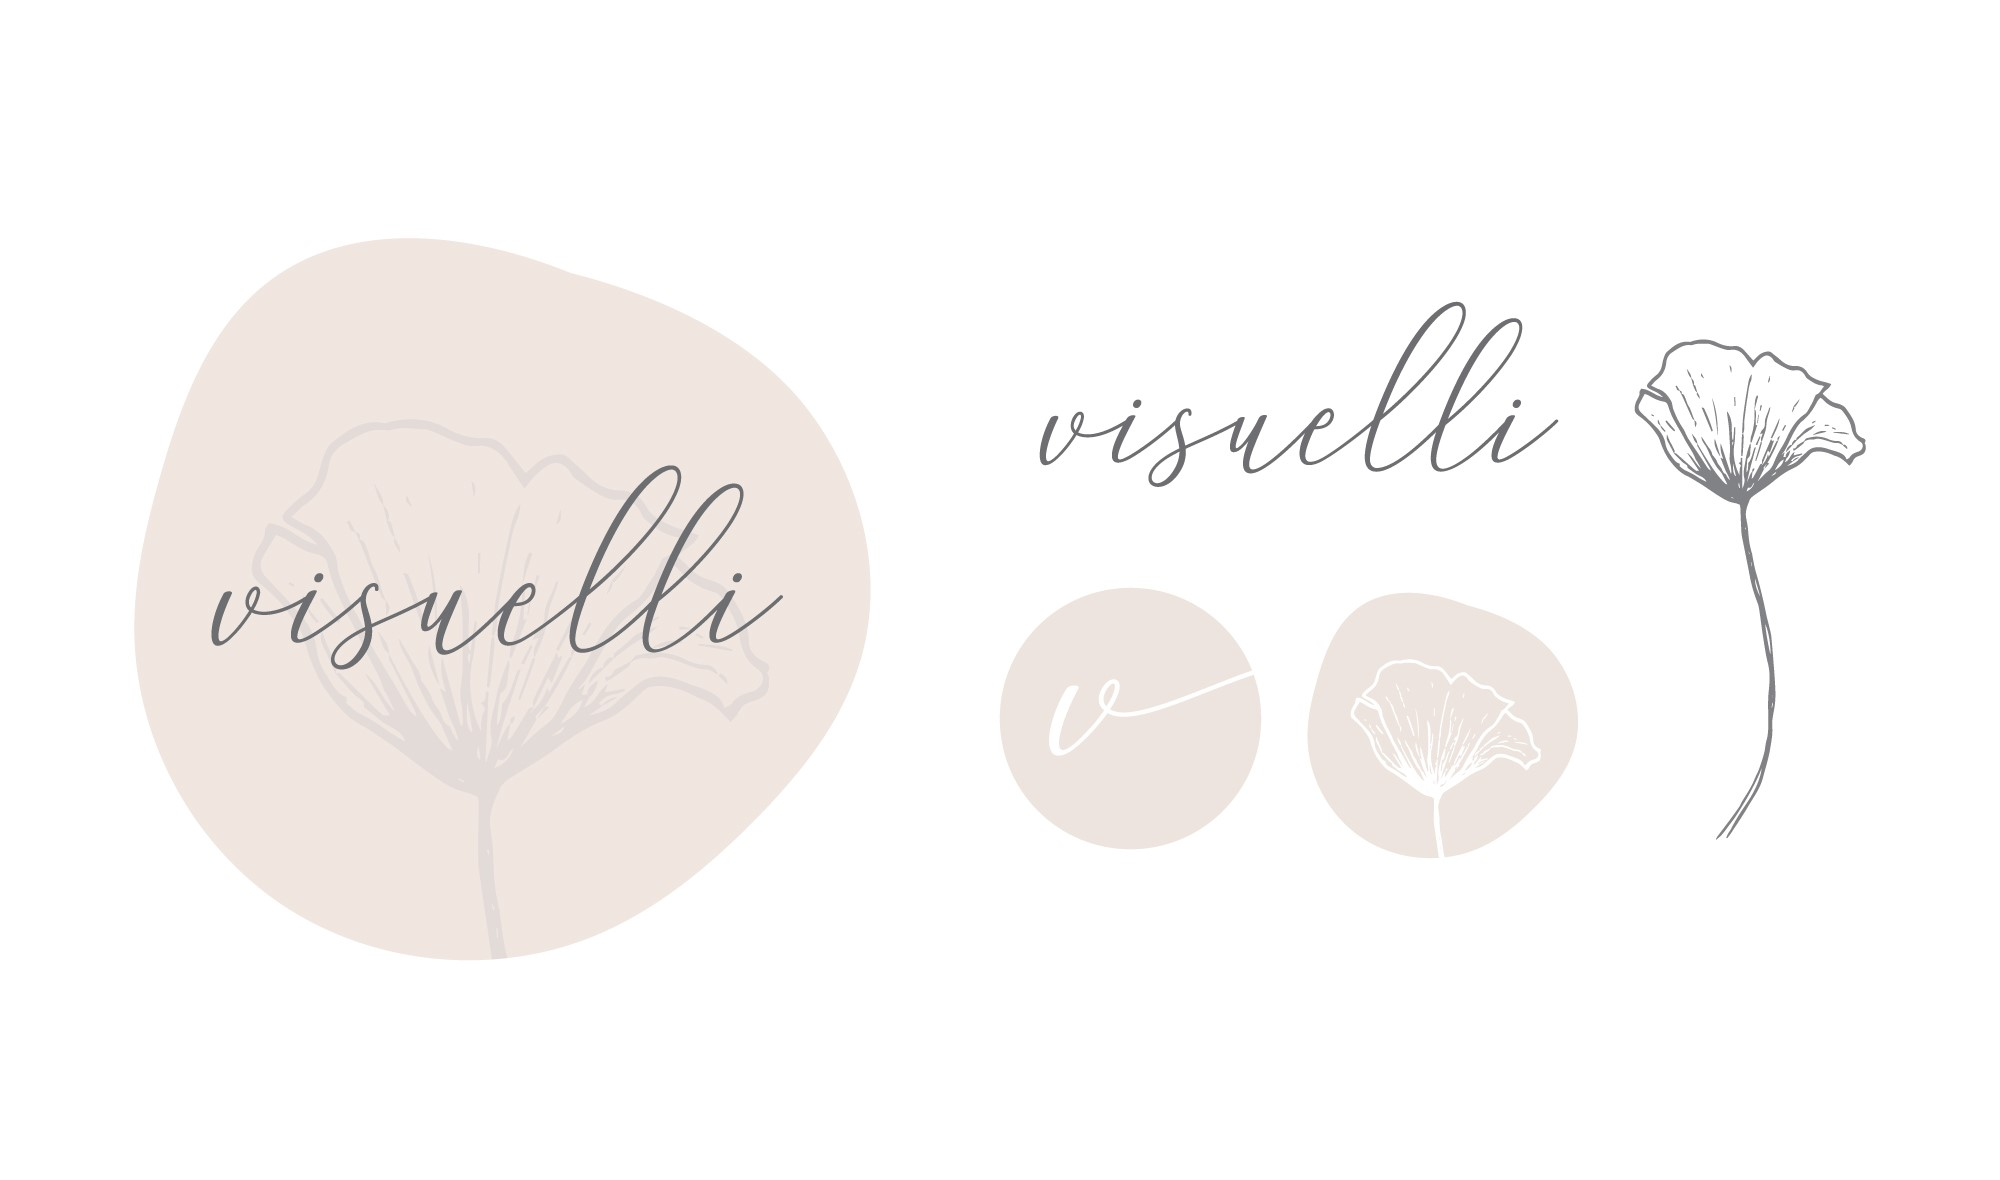 logo for Visuelli photography brand item